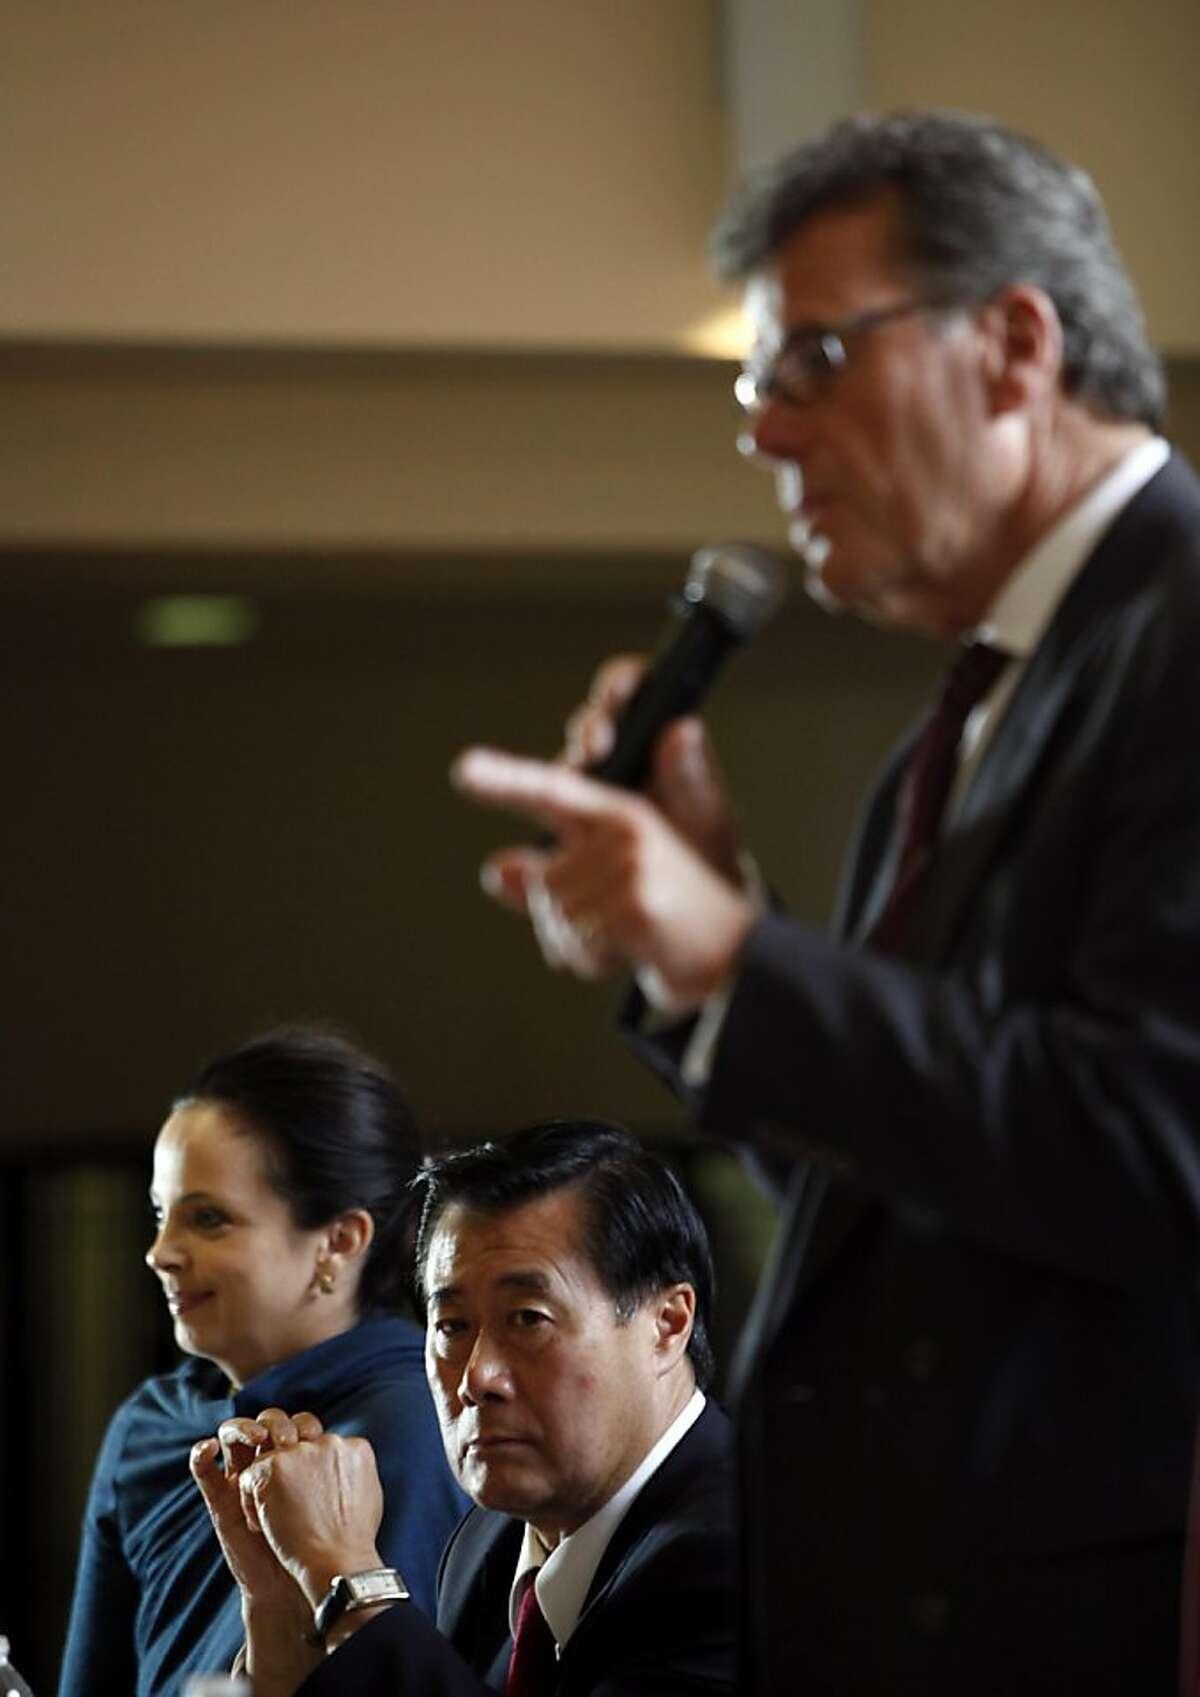 Democratic state senator Leland Yee, a San Francisco mayoral candidate, listens at the Fillmore Neighborhood Association mayoral debate in San Francisco, Calif., August 18, 2011.